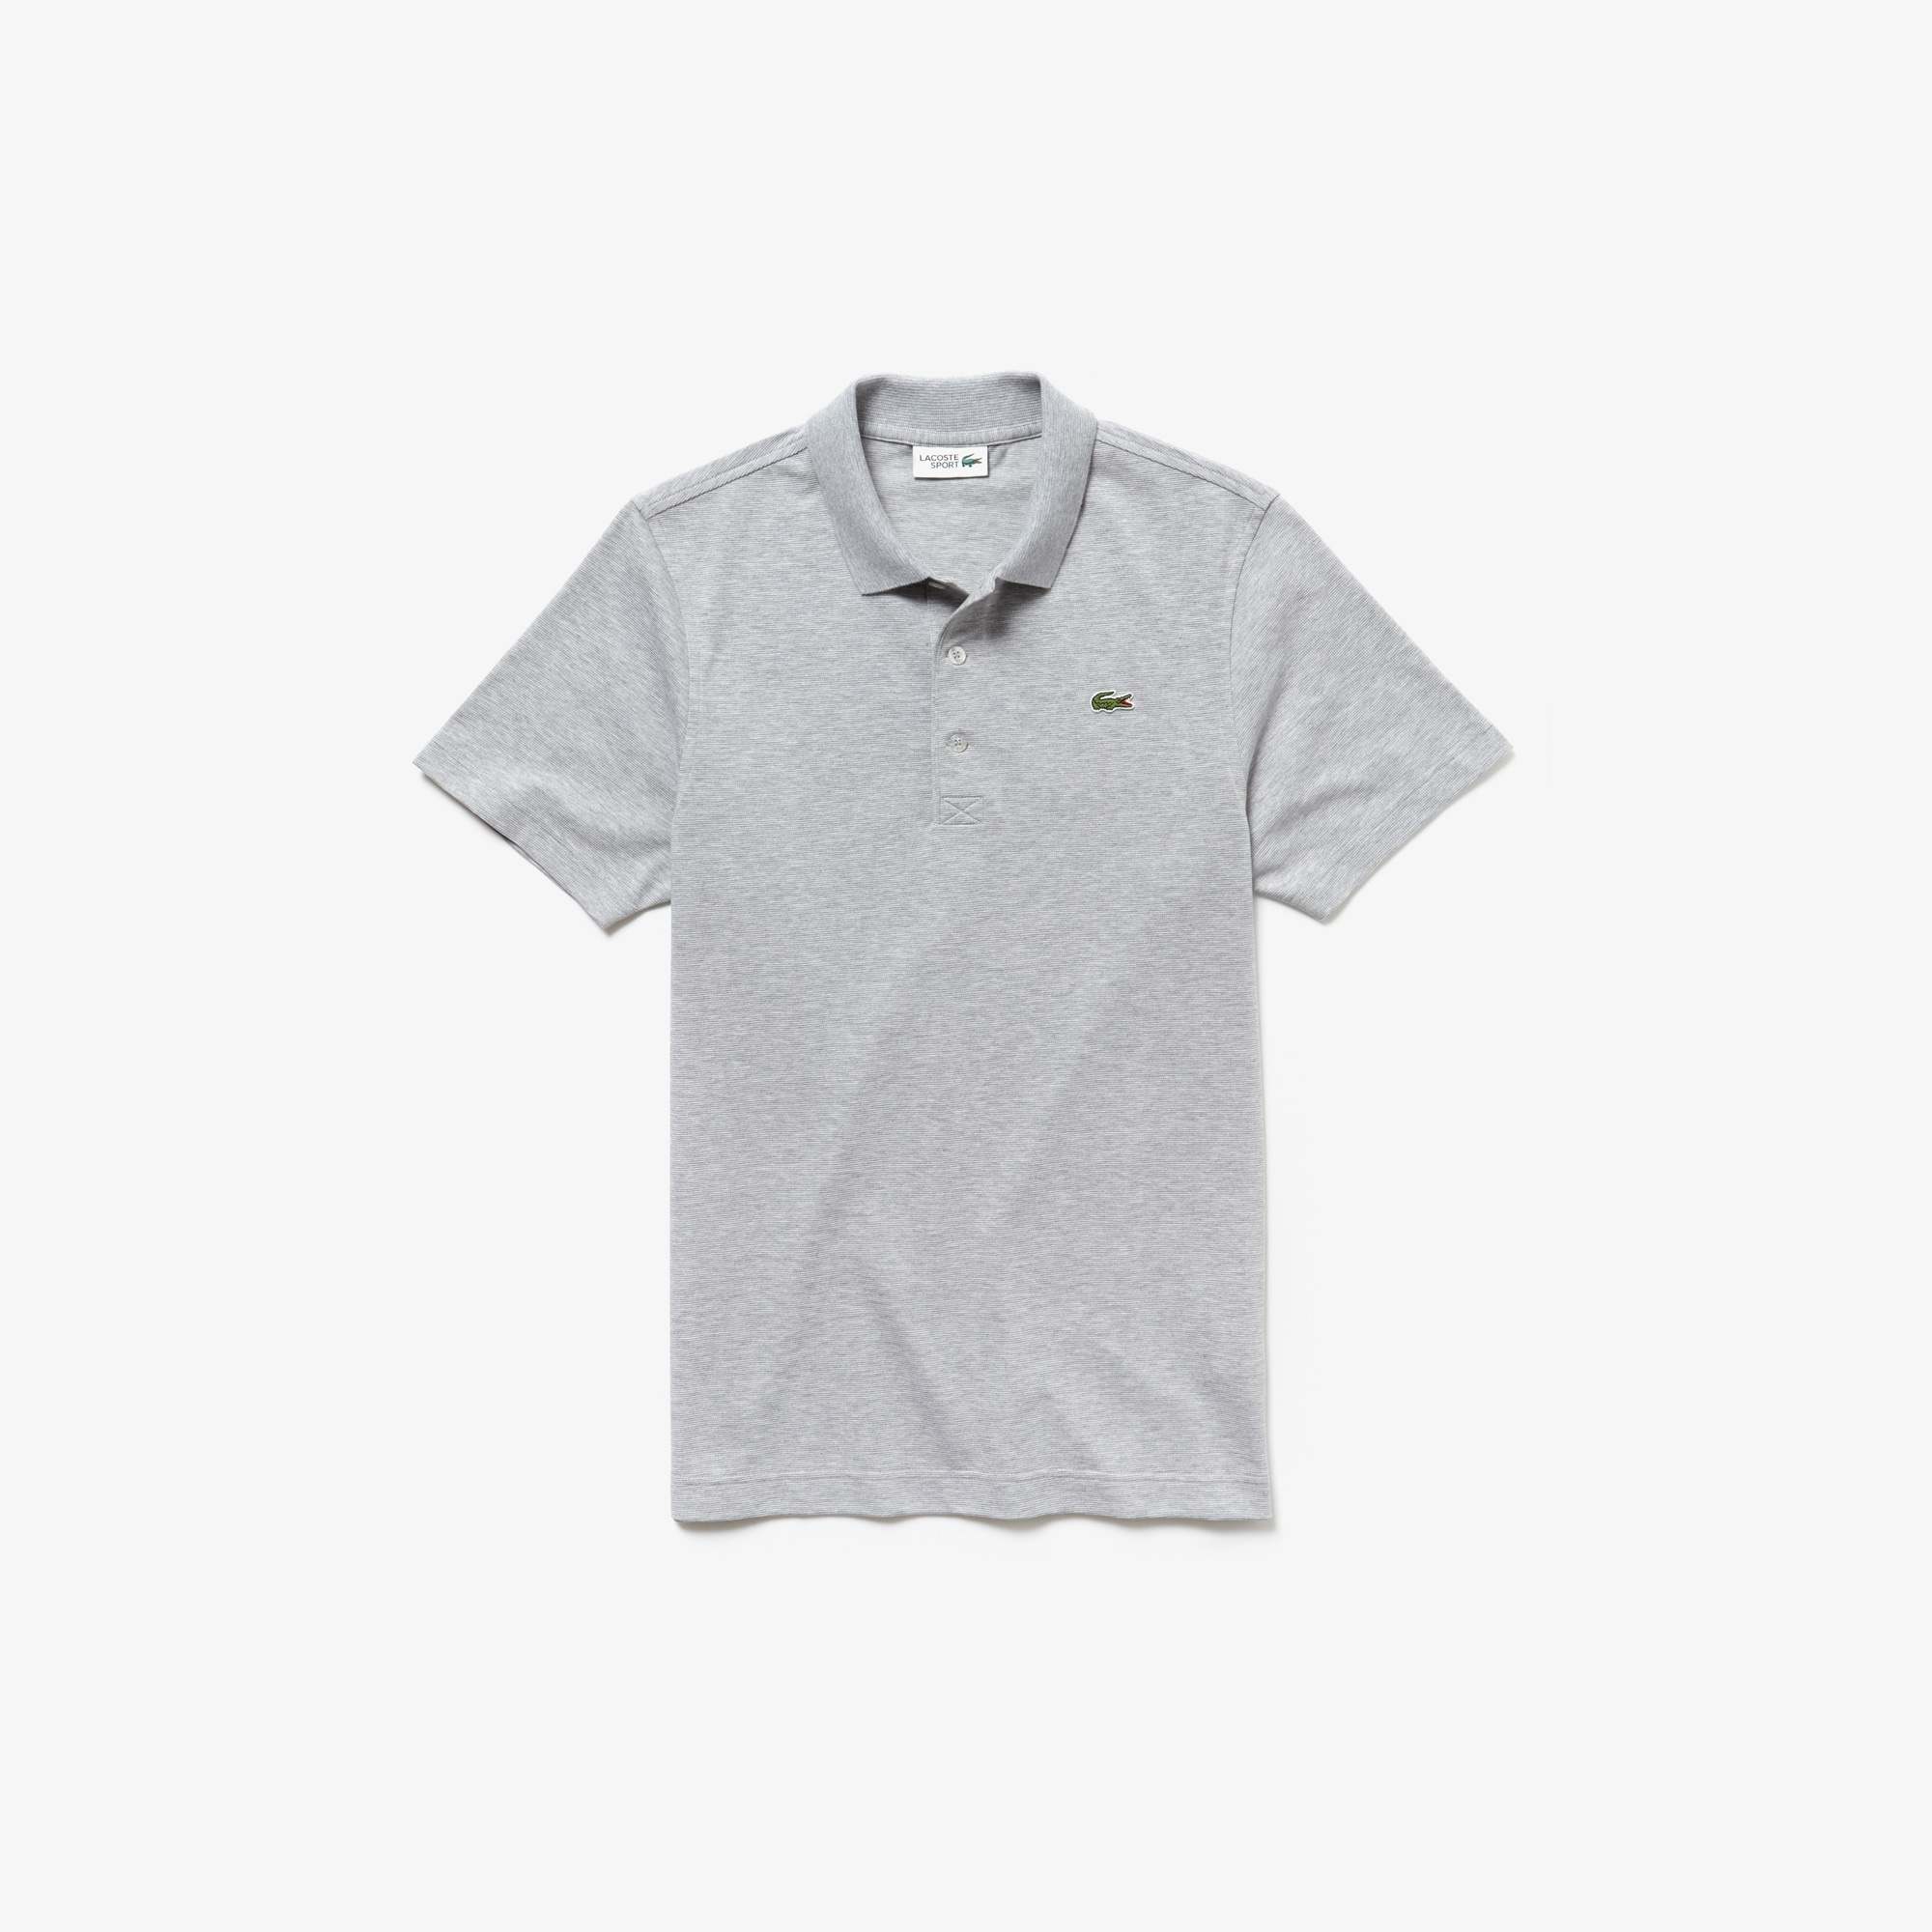 Camisa Polo Lacoste Sport Tennis Regular Fit Masculina em Malha Superleve